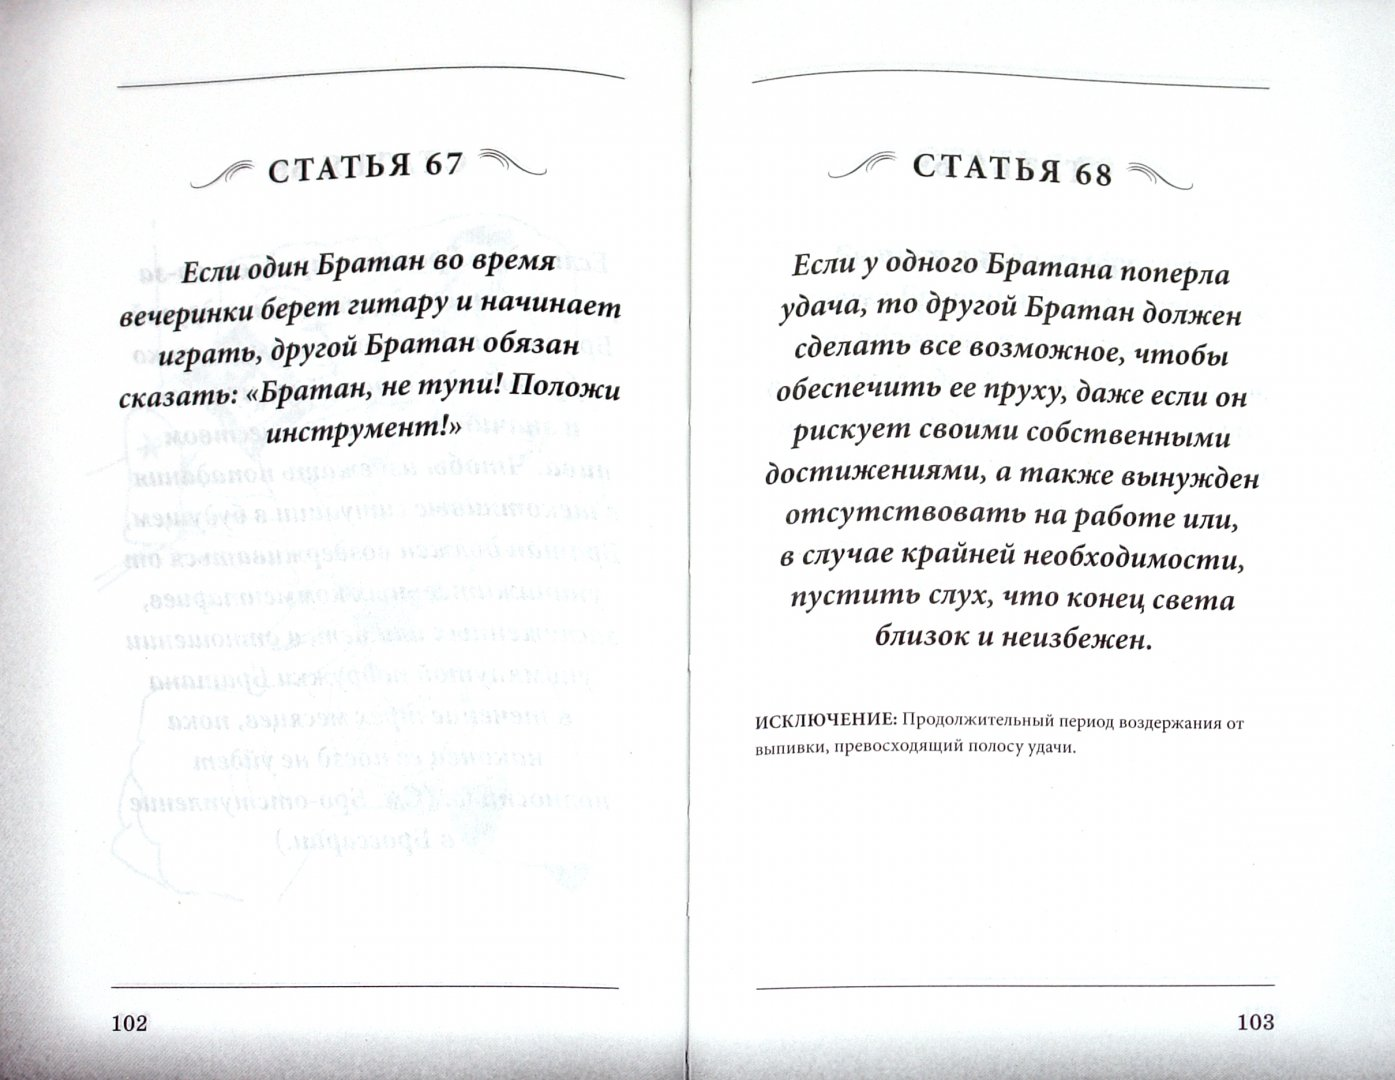 Иллюстрация 1 из 26 для Кодекс Братана - Барни Стинсон | Лабиринт - книги. Источник: Лабиринт